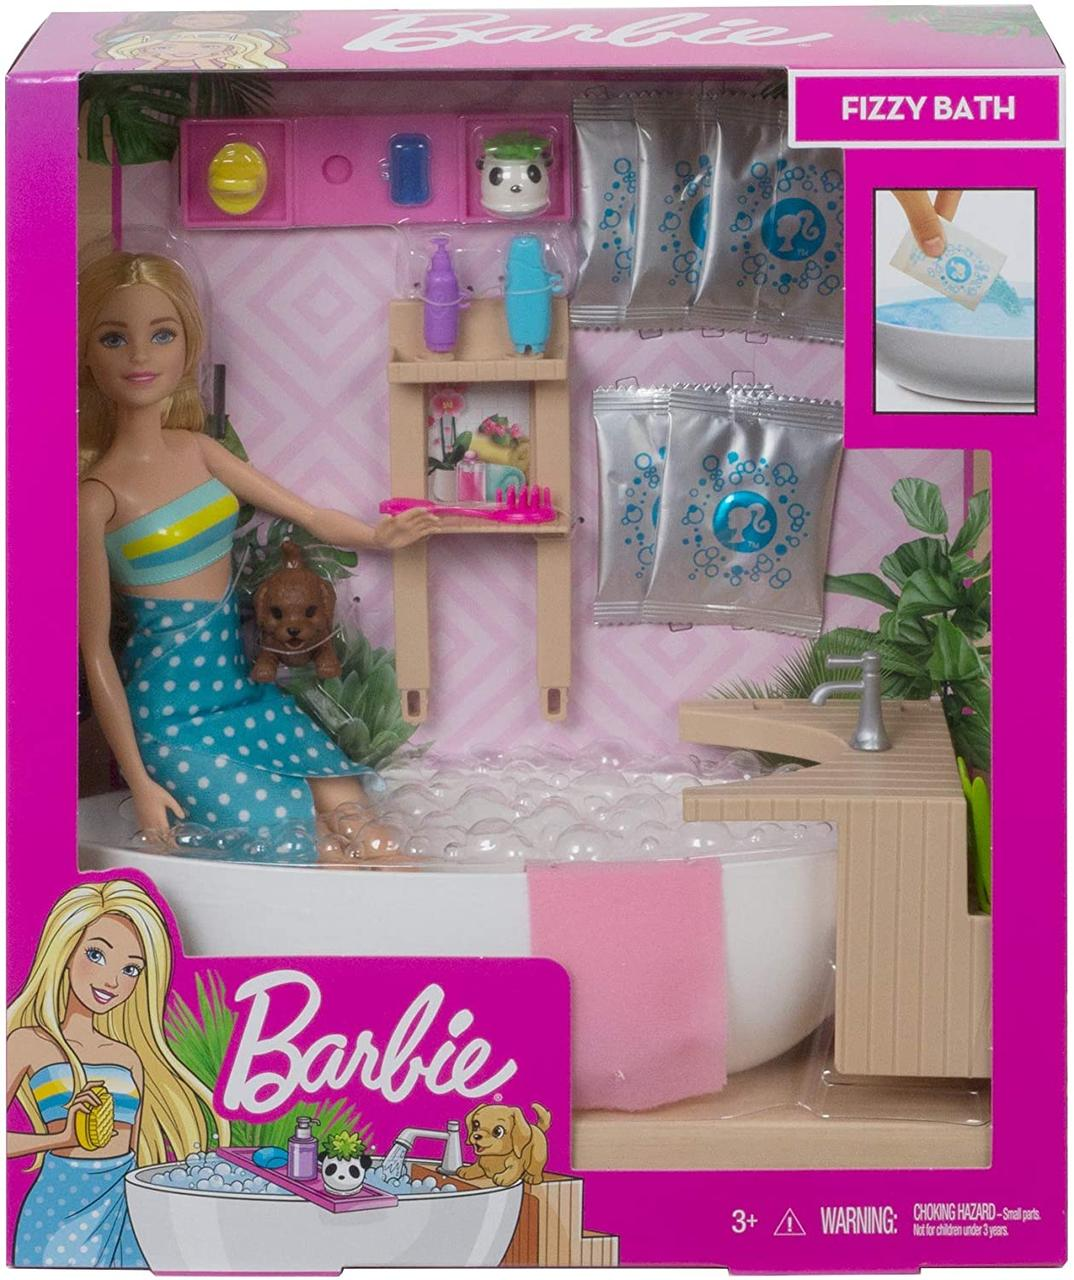 Игровой набор Кукла Барби и Шипучая ванна - Barbie Fizzy Bath Doll & Playset, Blonde GJN32